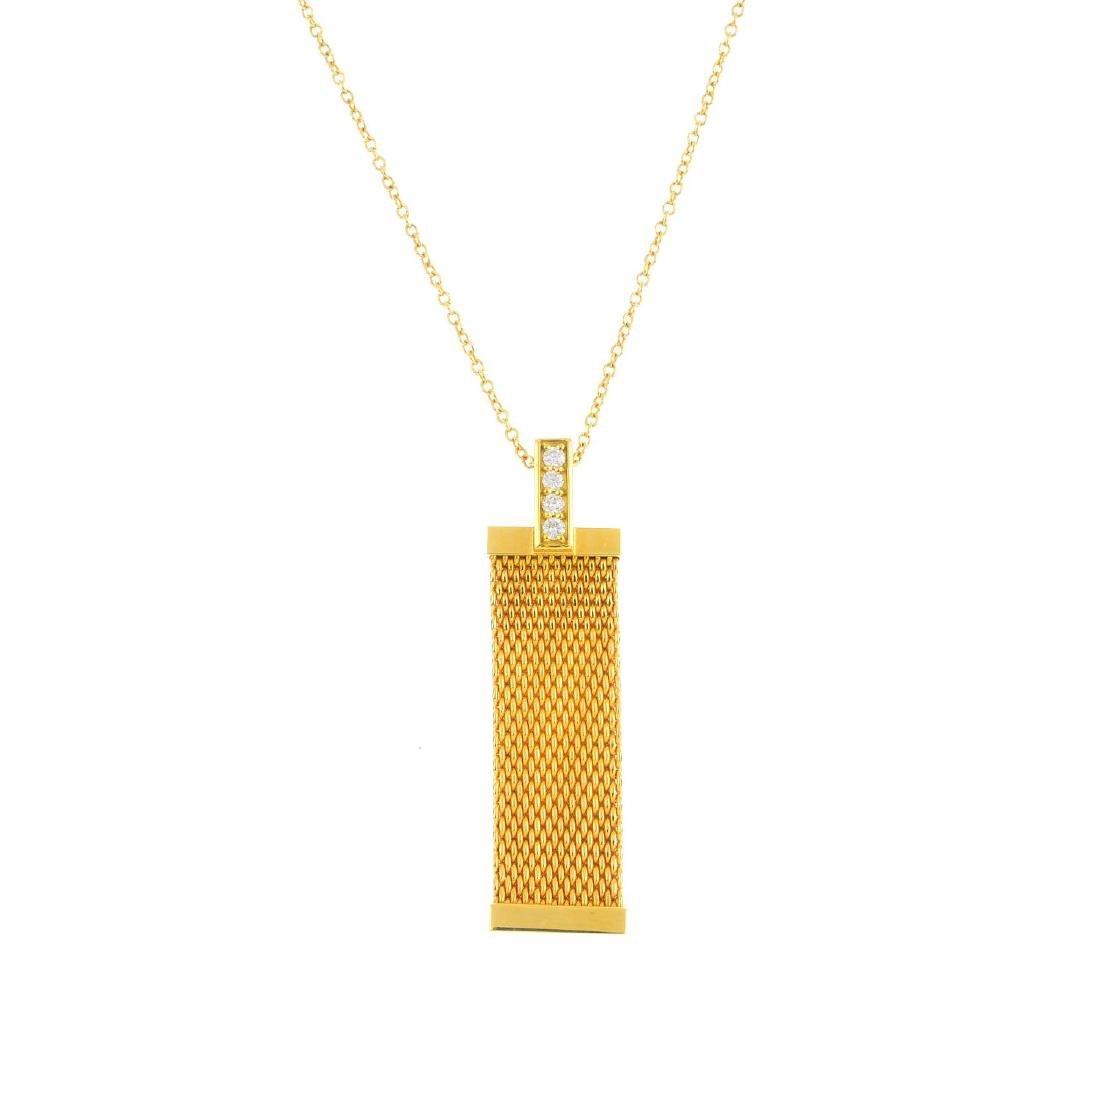 TIFFANY & CO. - a diamond 'Somerset' pendant. The